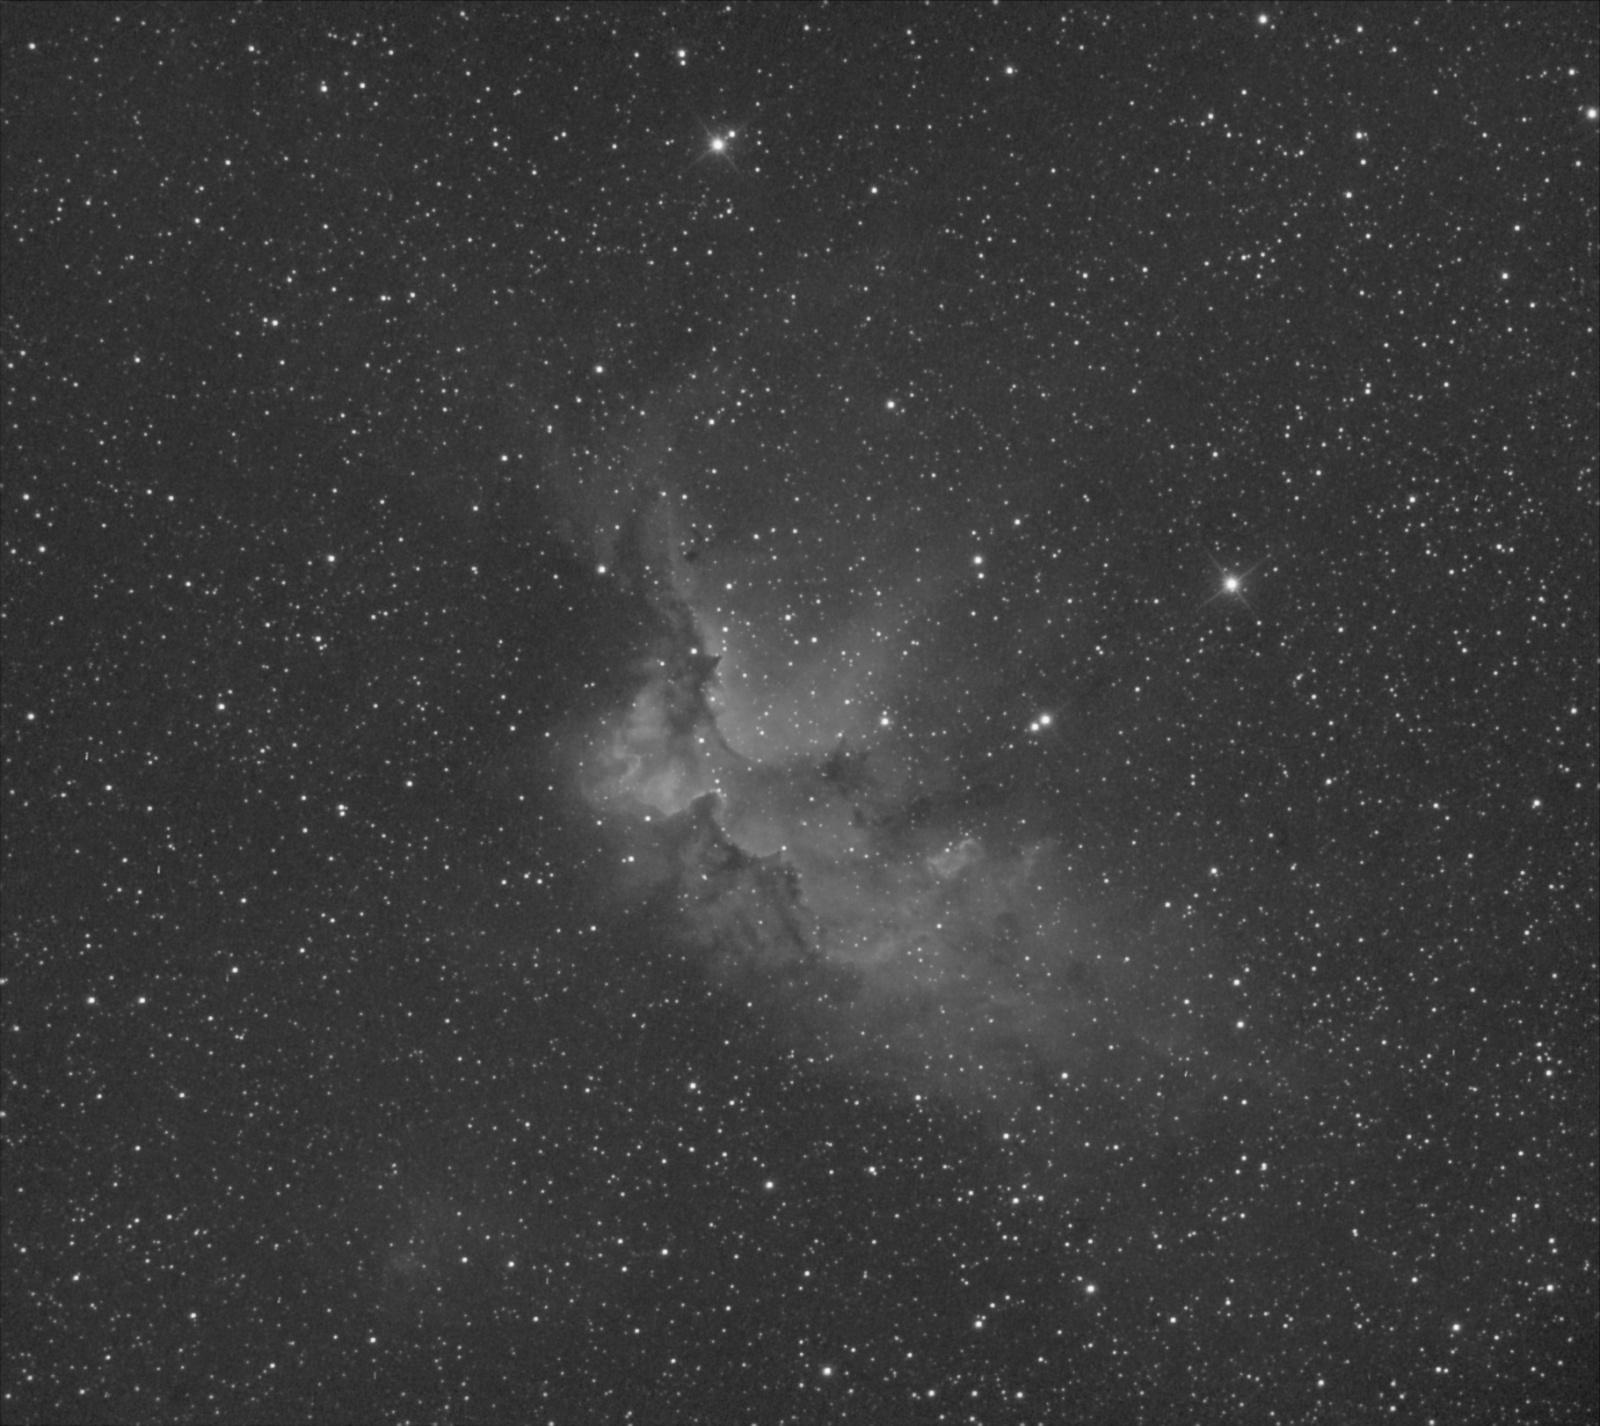 NGC7380_Ha.thumb.jpg.efcb0cdd656a9fa2c2ab5b861d623bf2.jpg